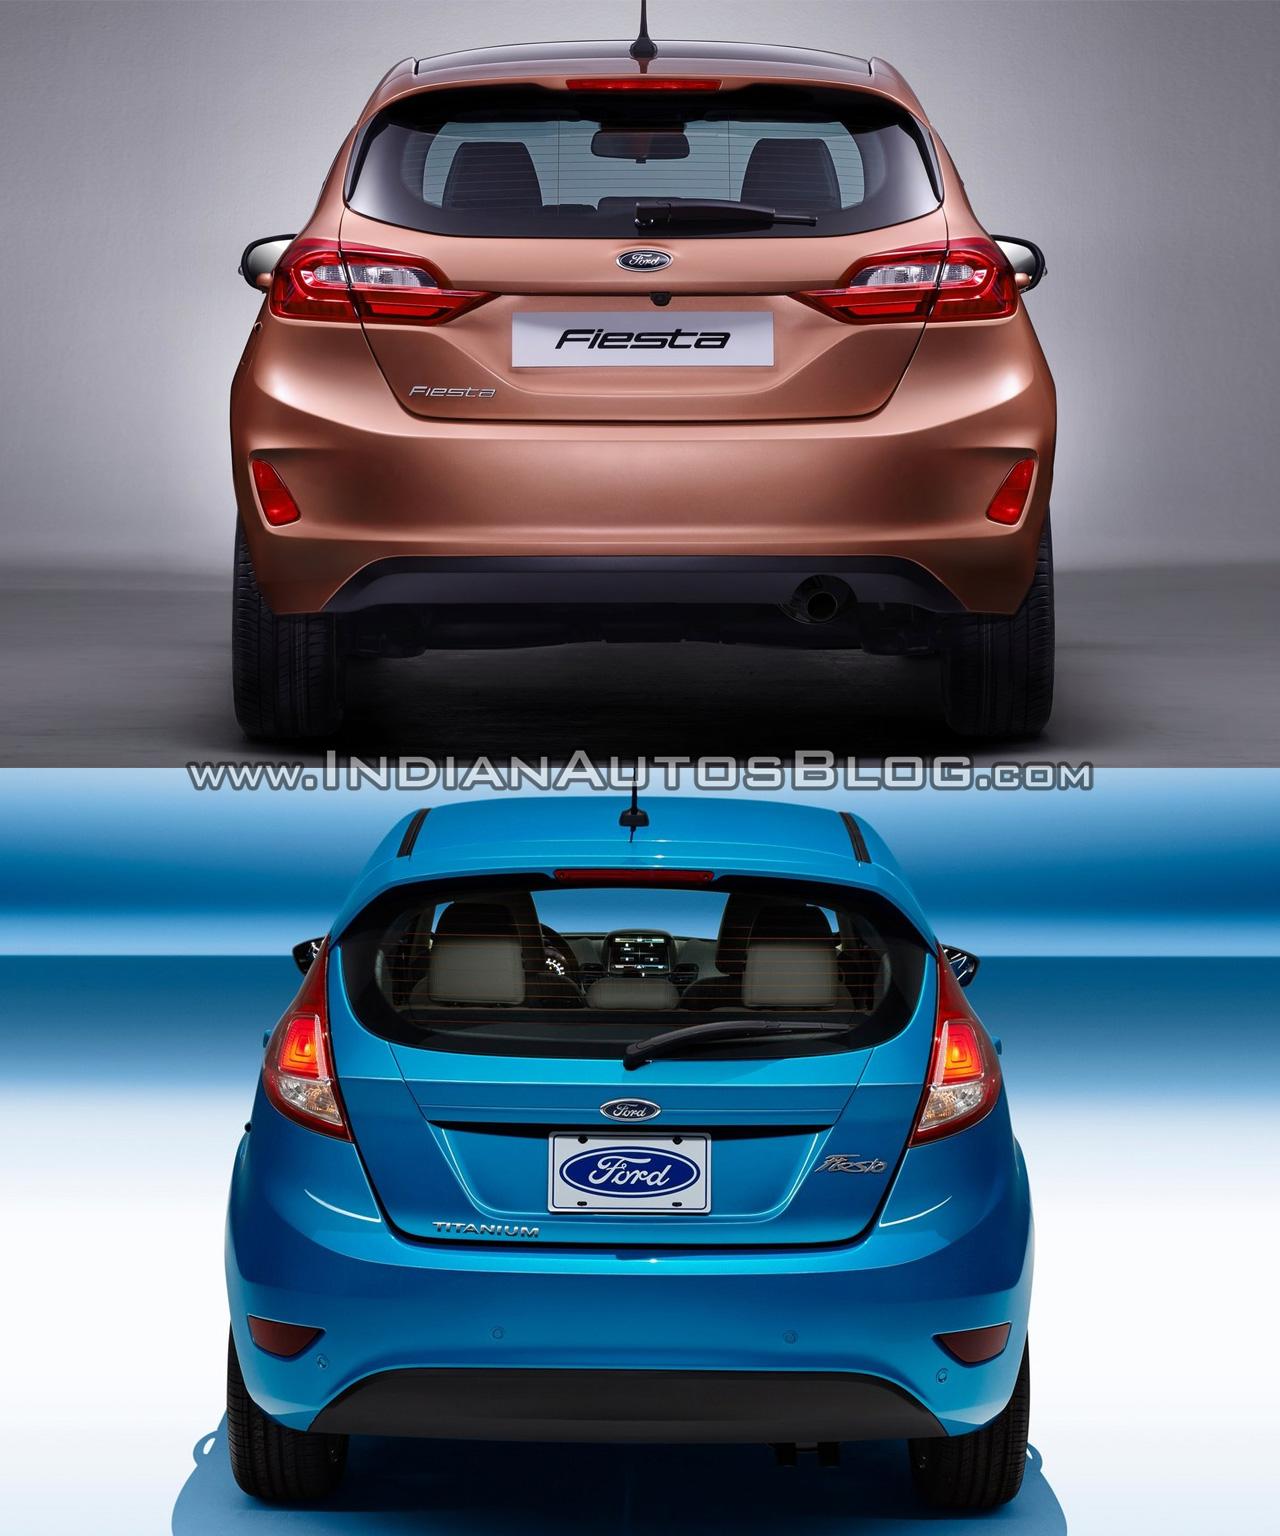 2013 Ford Fiesta: 2017 Ford Fiesta Vs 2013 Ford Fiesta Rear Old Vs New